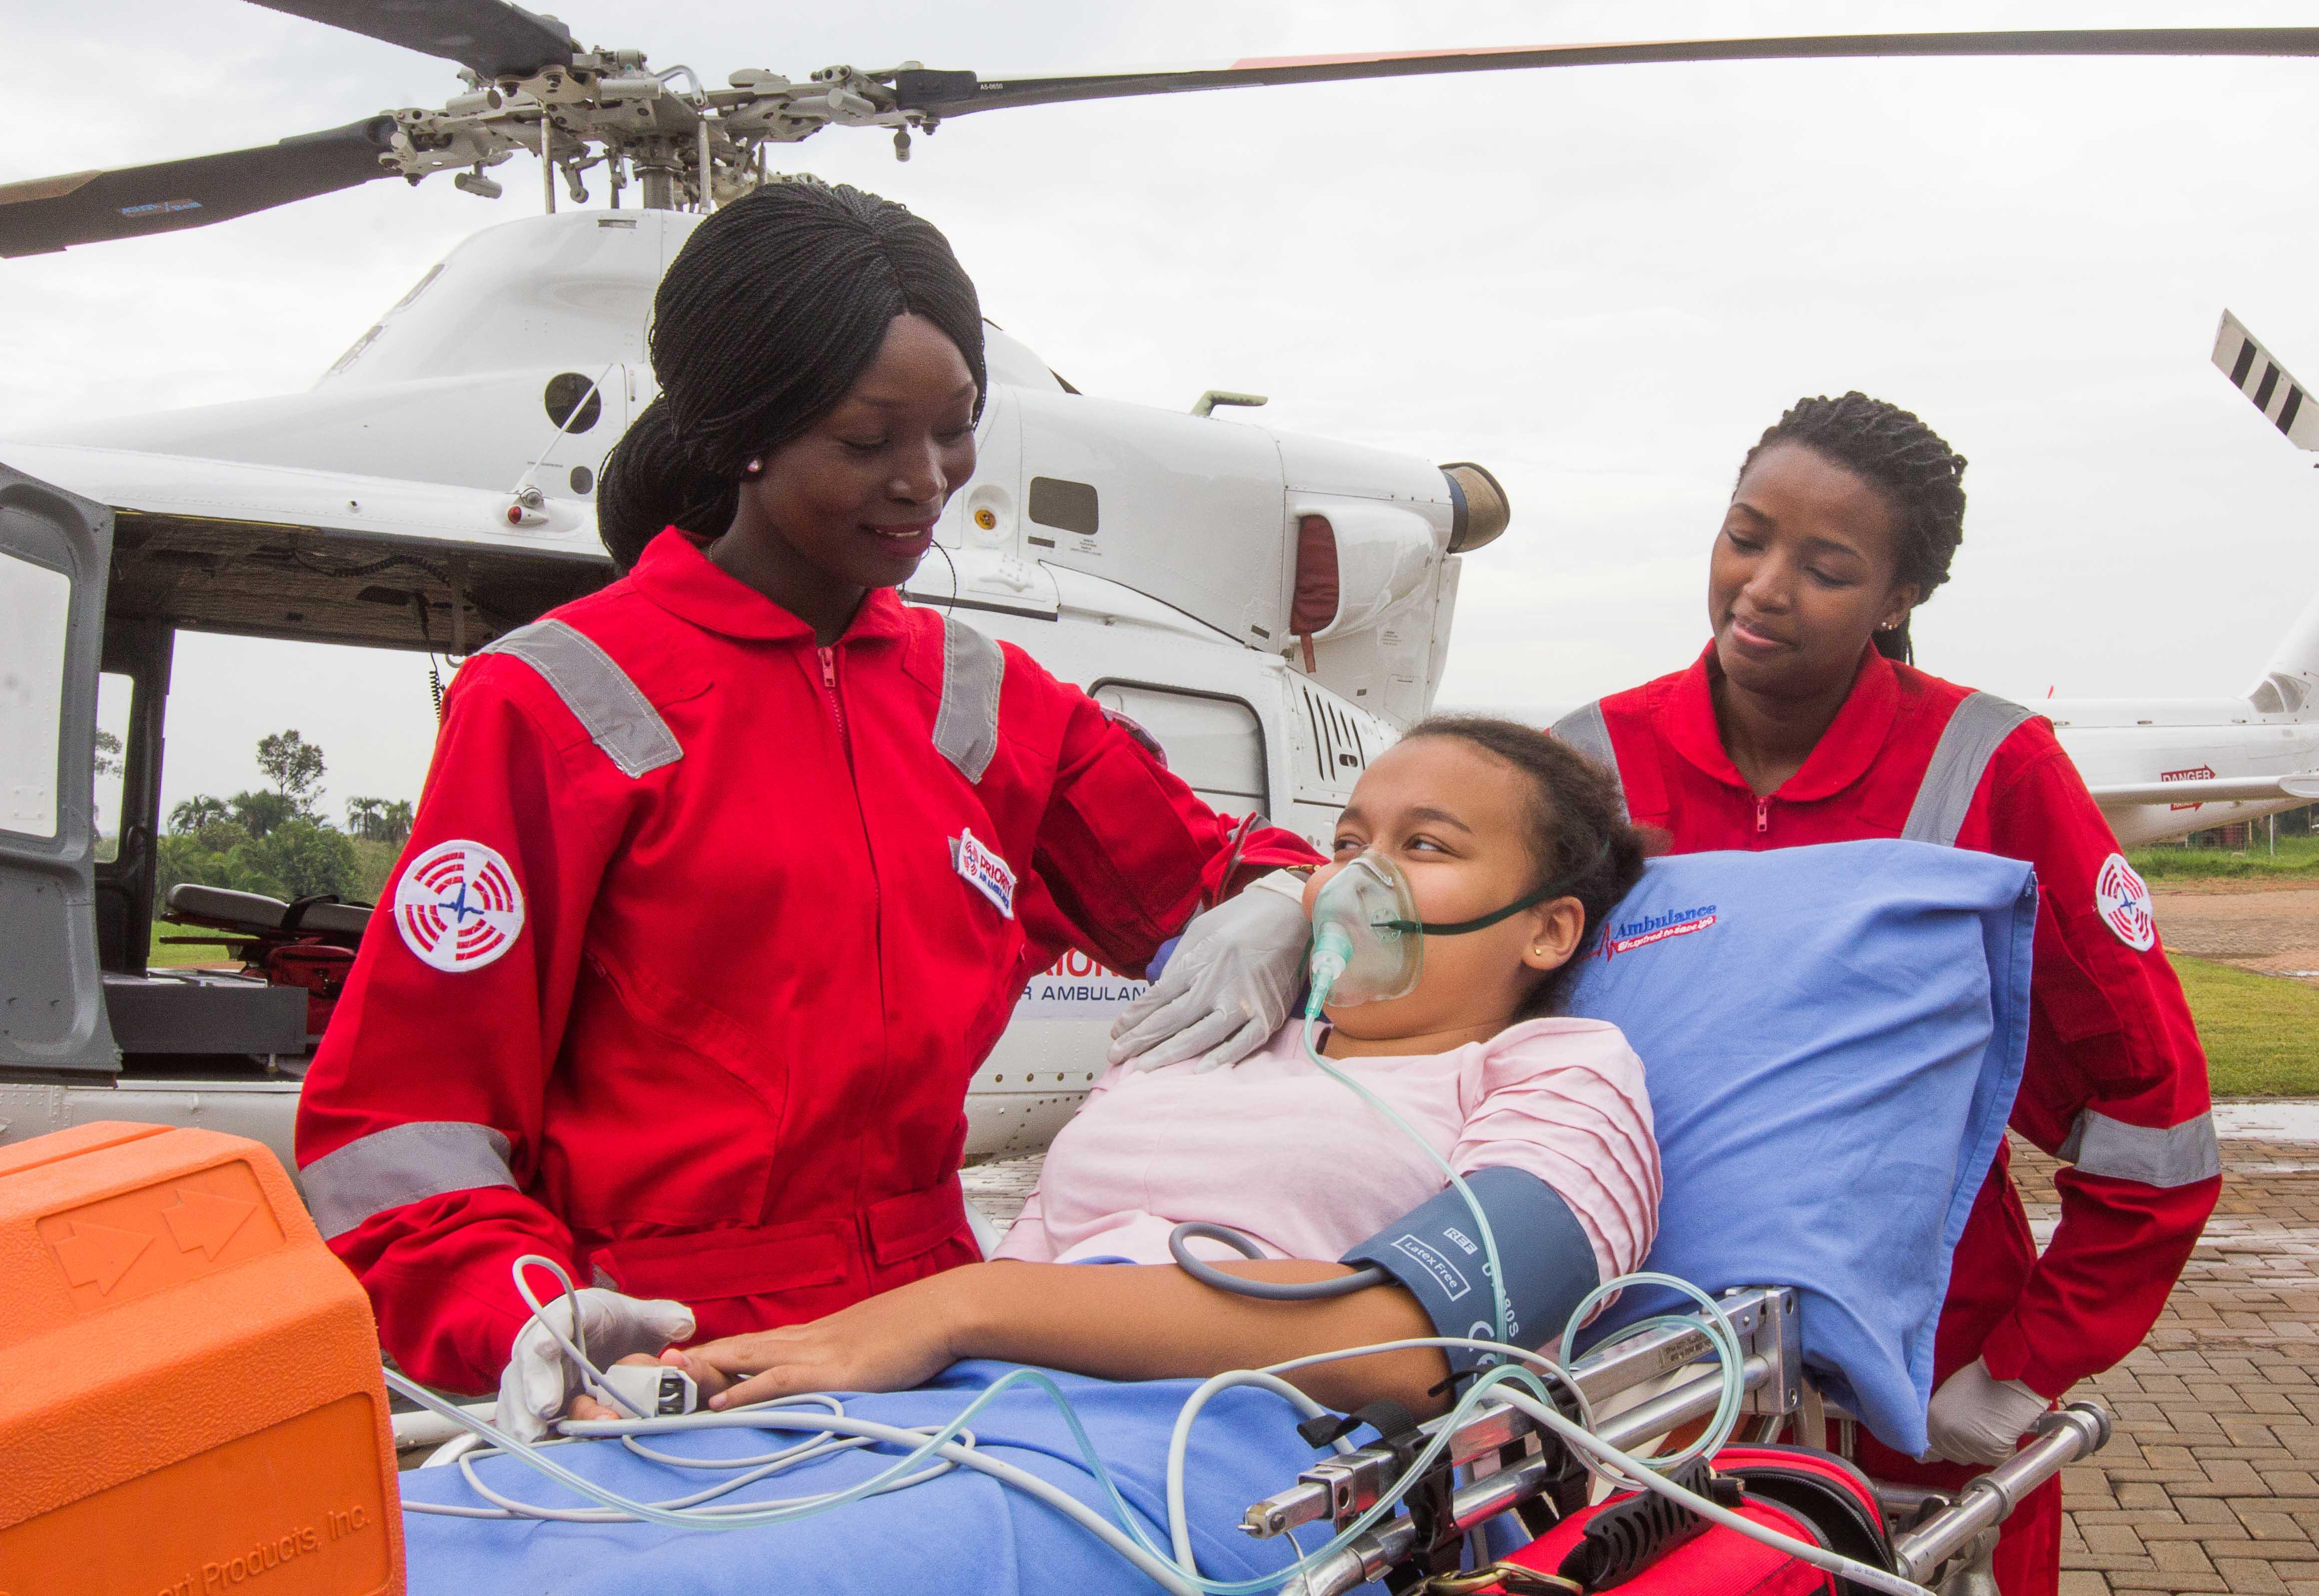 Priority Air Ambulance branding